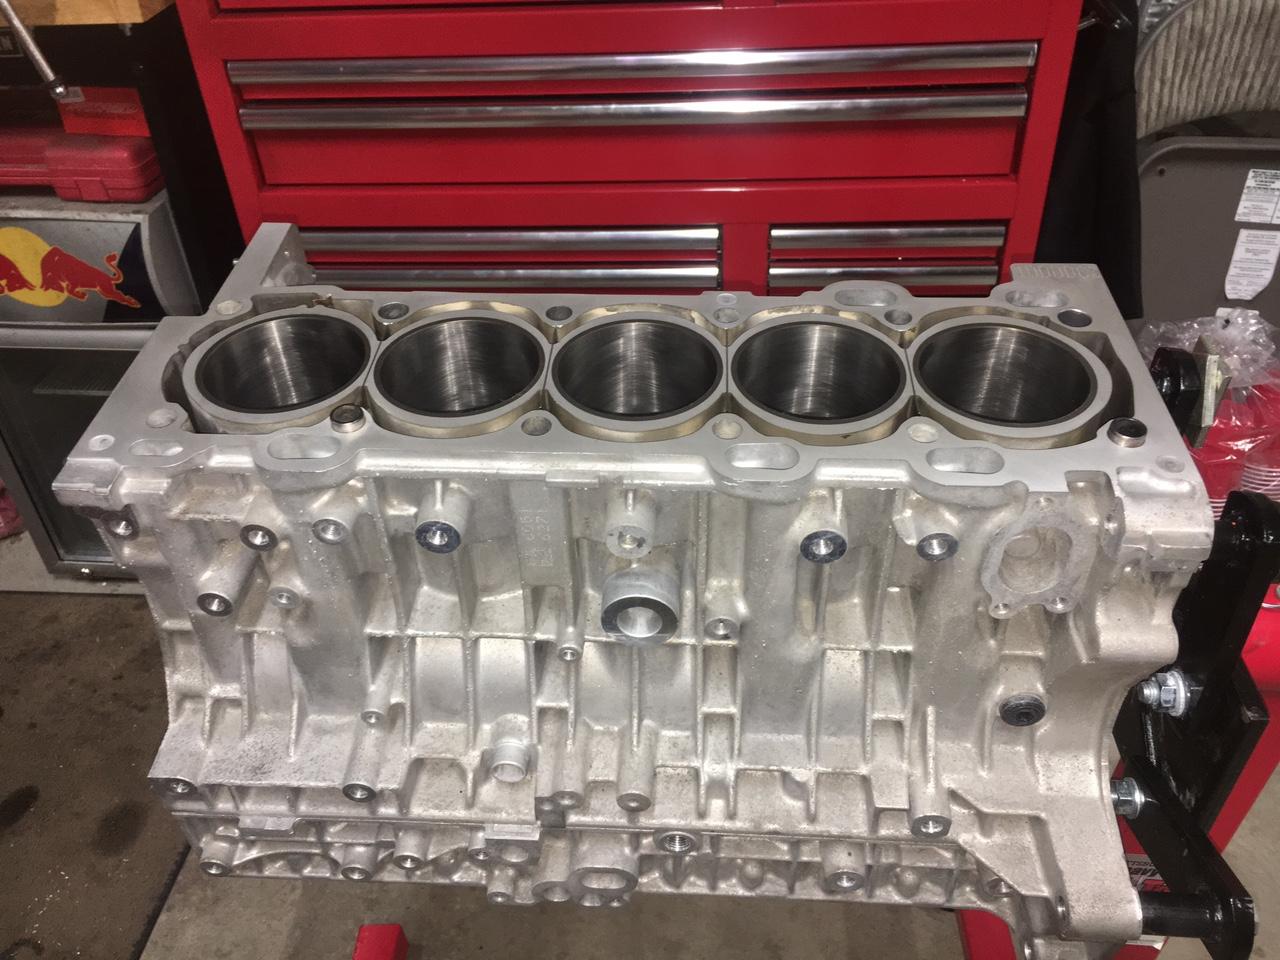 Austin V70R 2 4 T5 Build